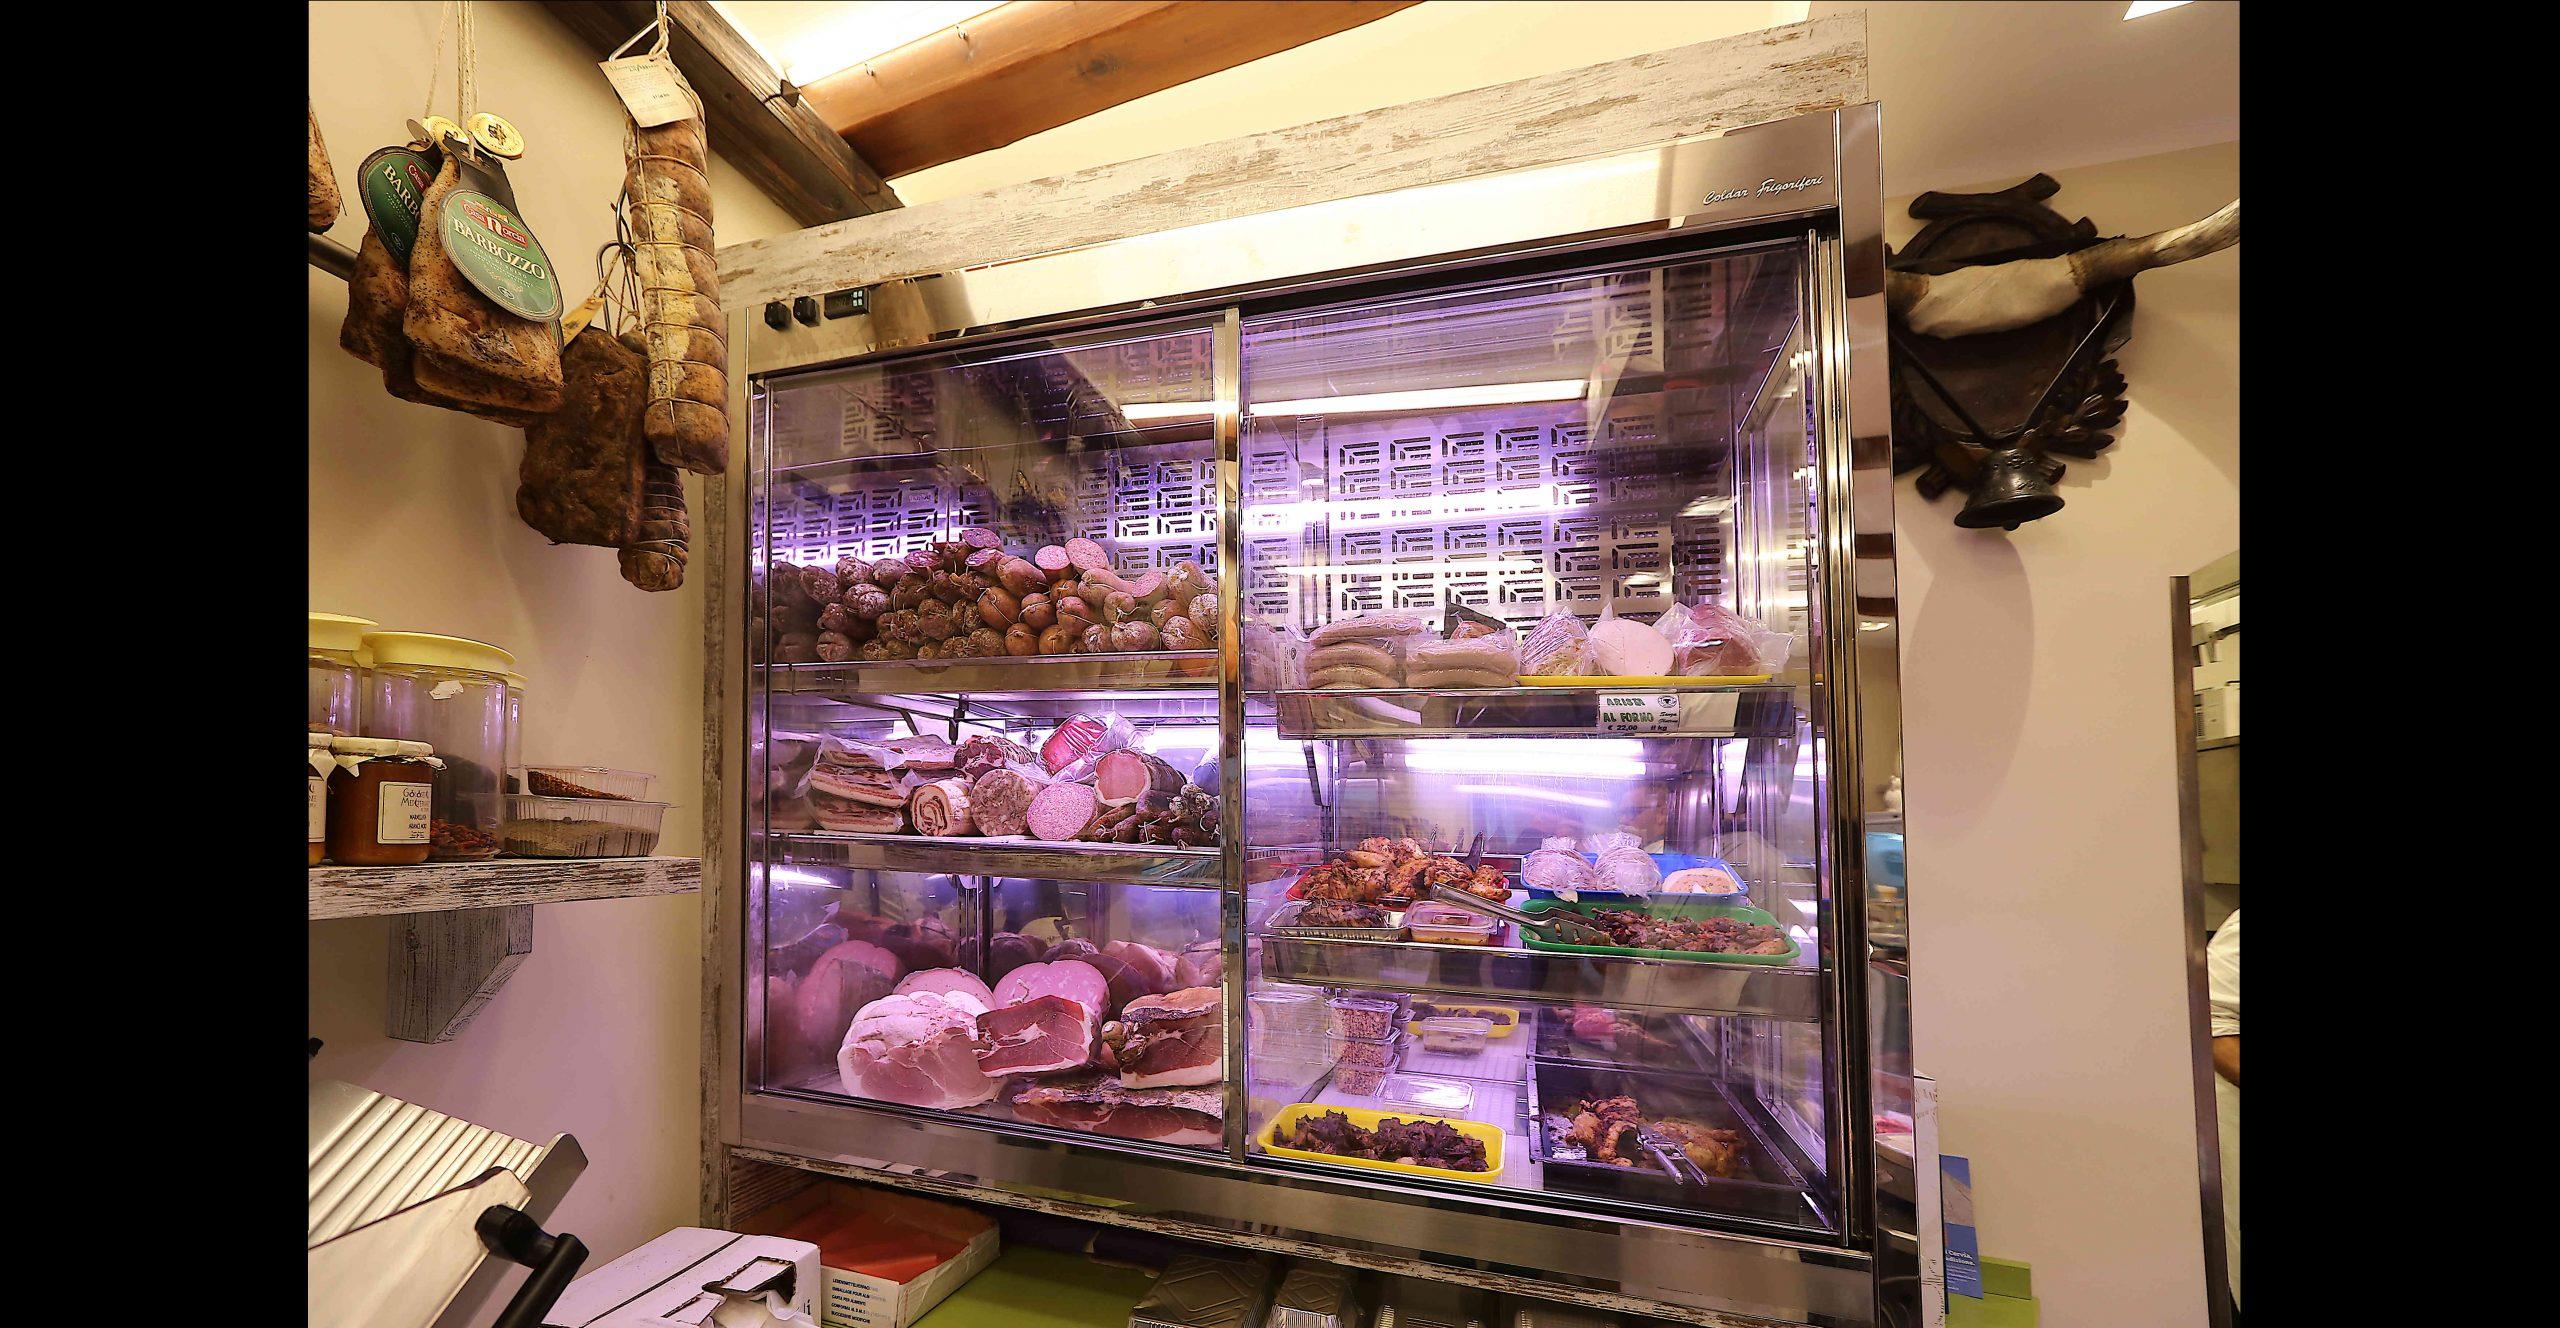 espositori frigoriferi